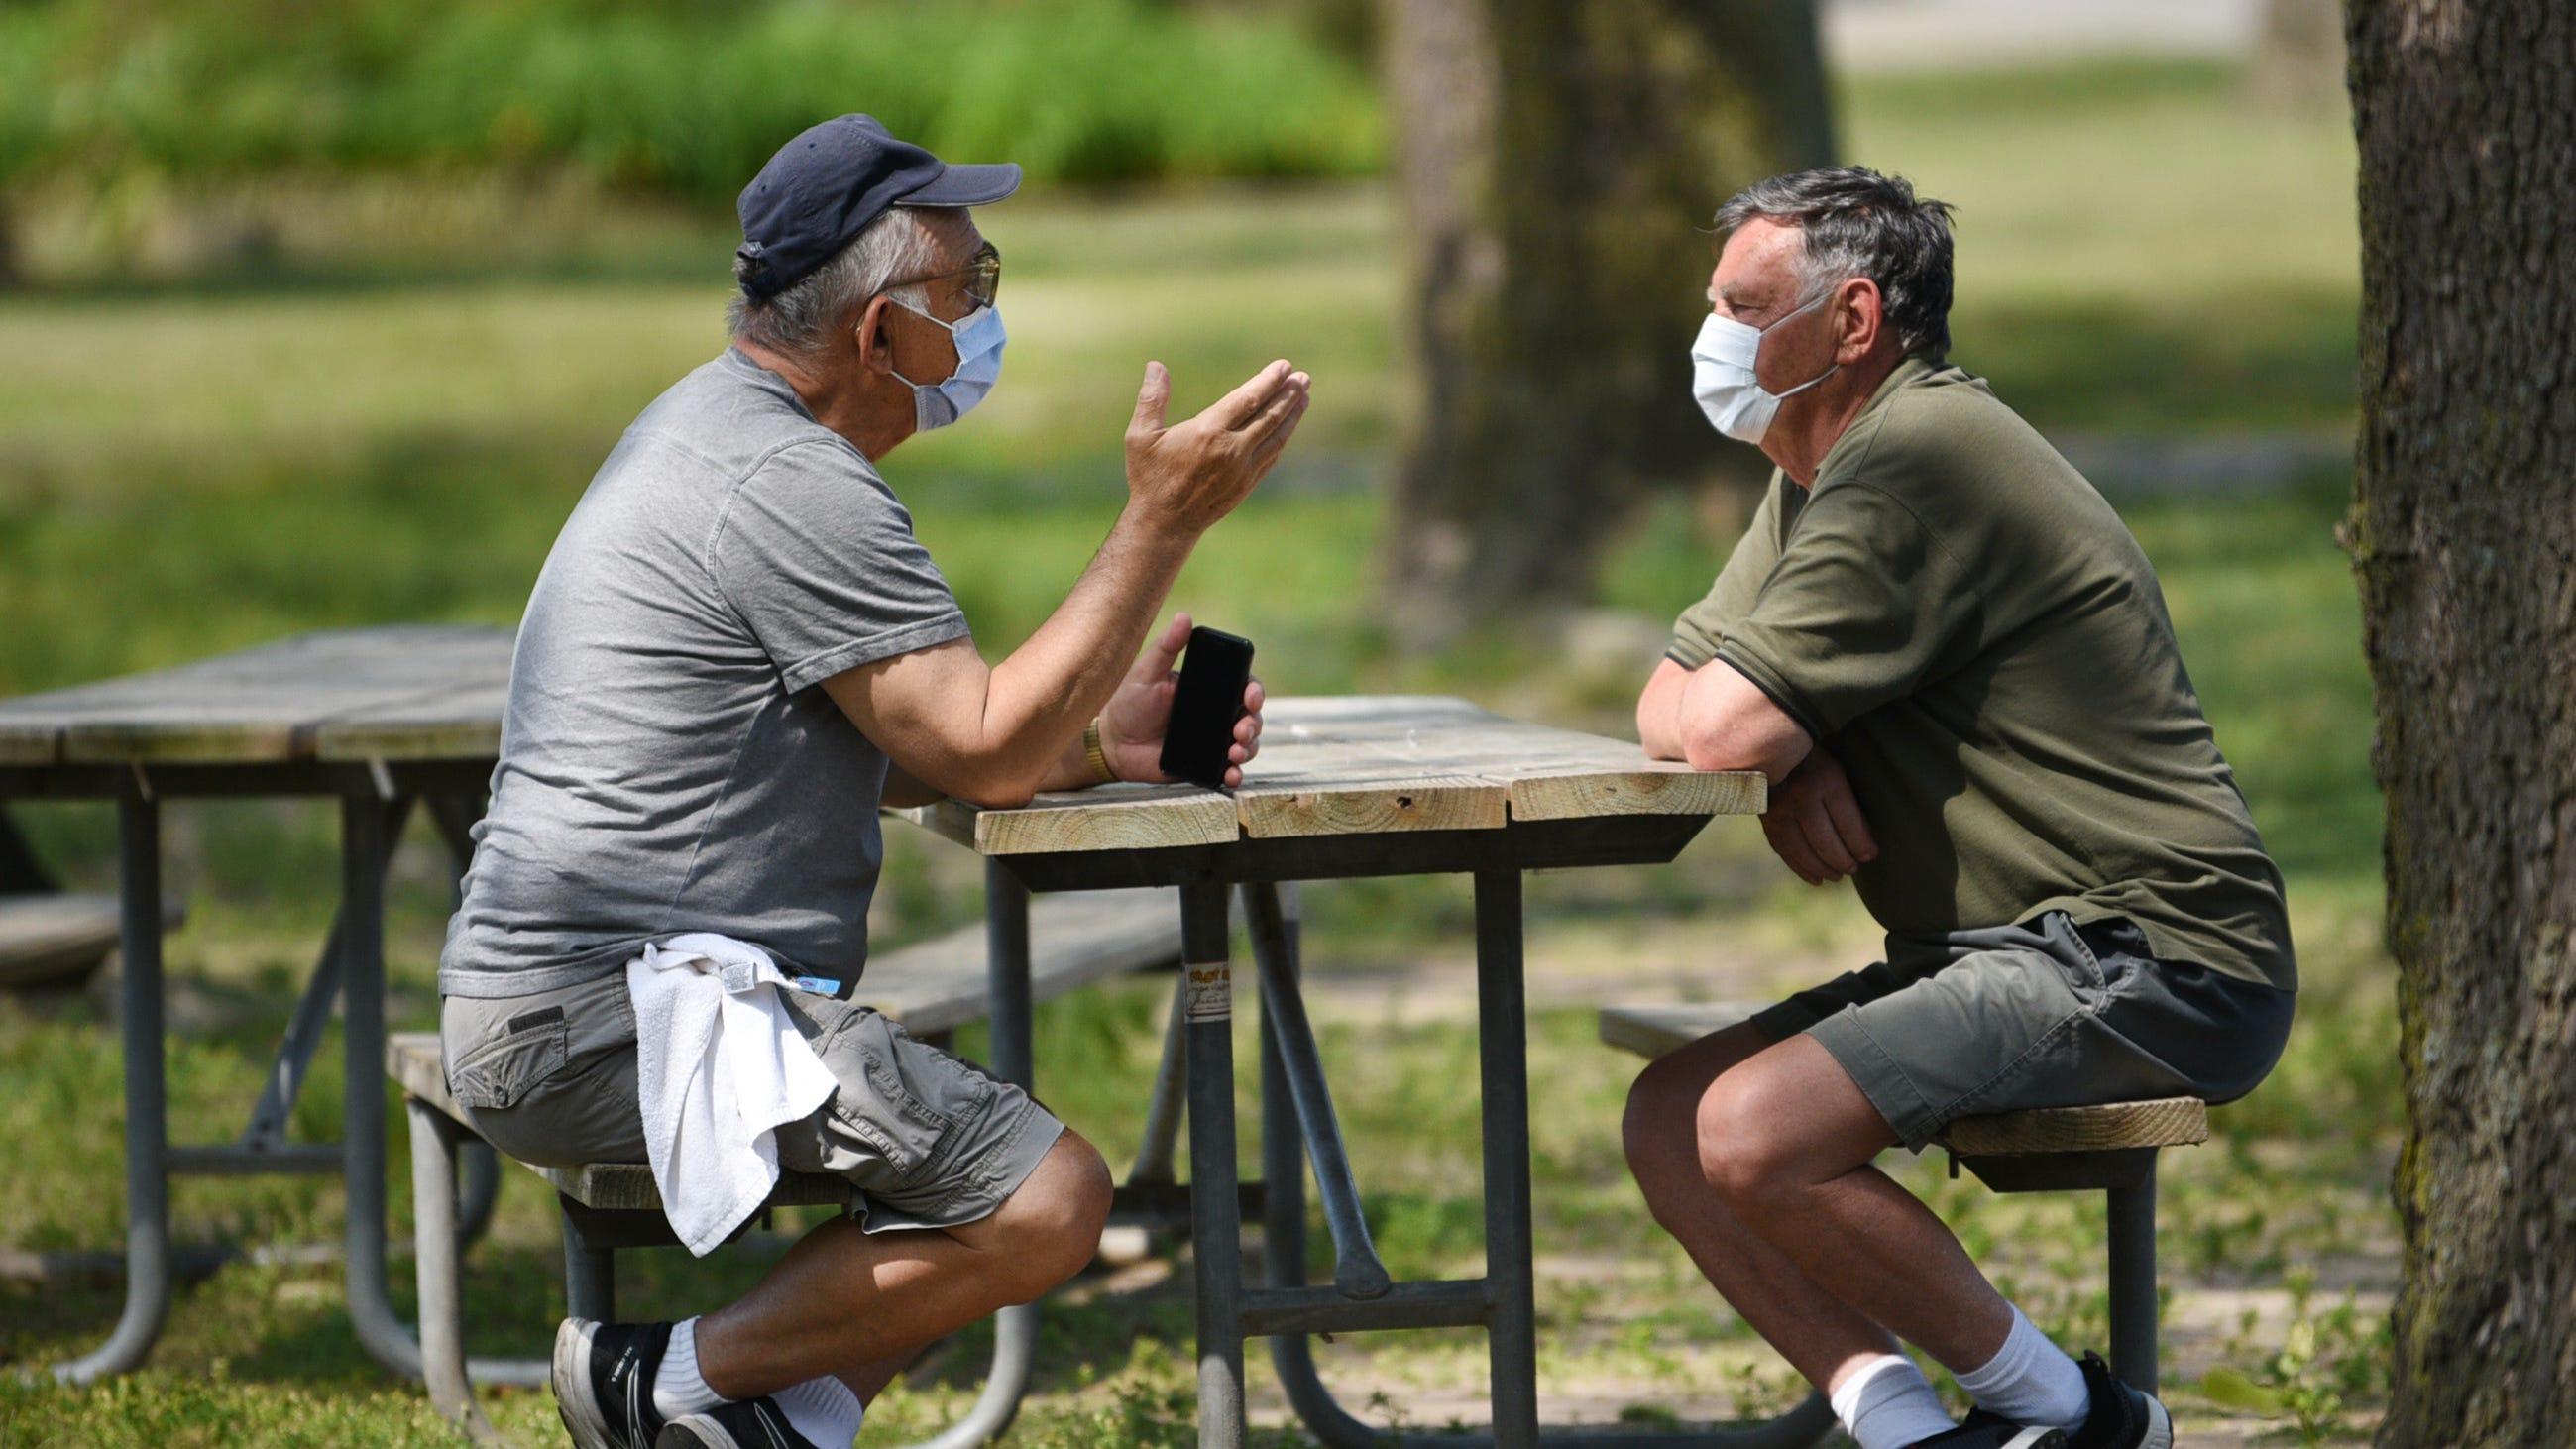 Stepping outside? Masks are mandatory, Murphy says